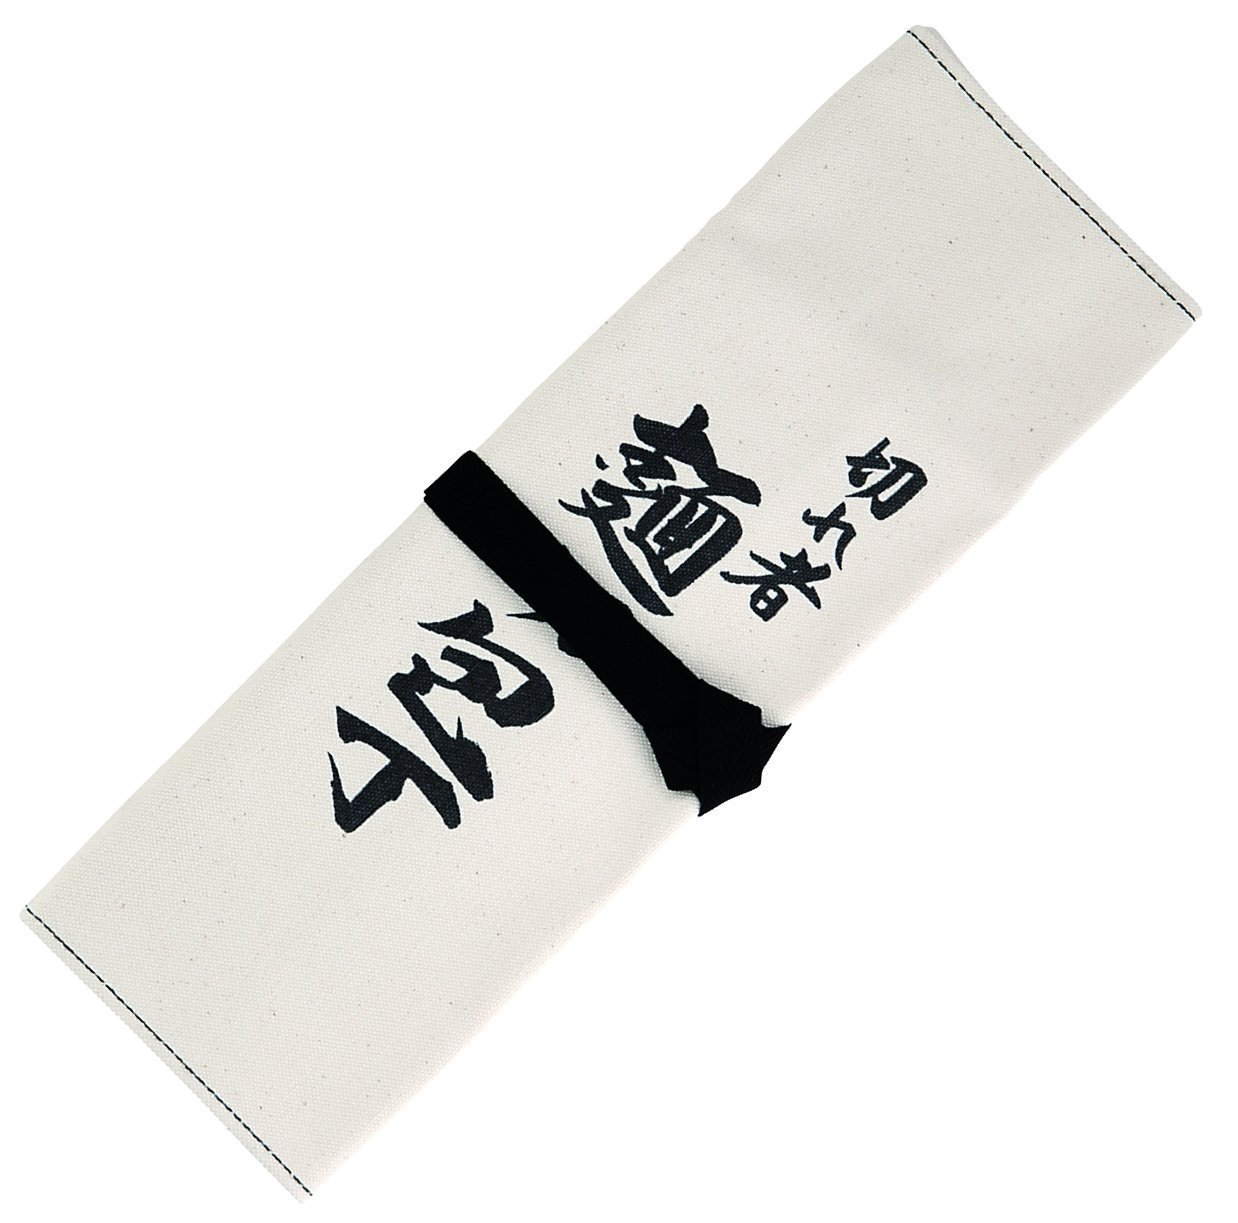 HONEN Kitchen Chef's Knives Knife Houchou Carry Case Japan New